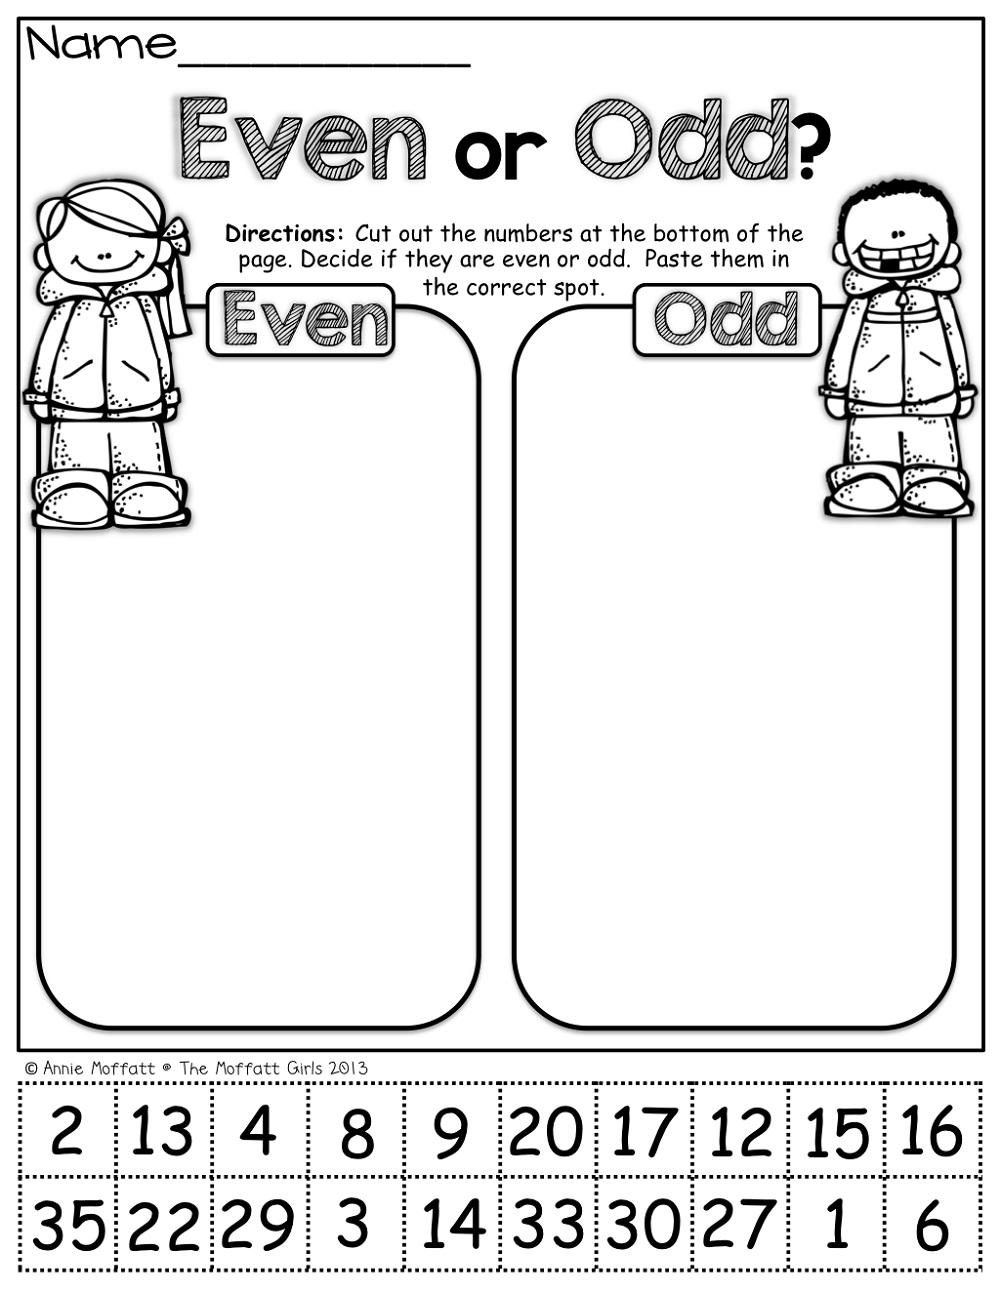 Even Odd Worksheets Printable   101 Activity   Math school [ 1293 x 1000 Pixel ]